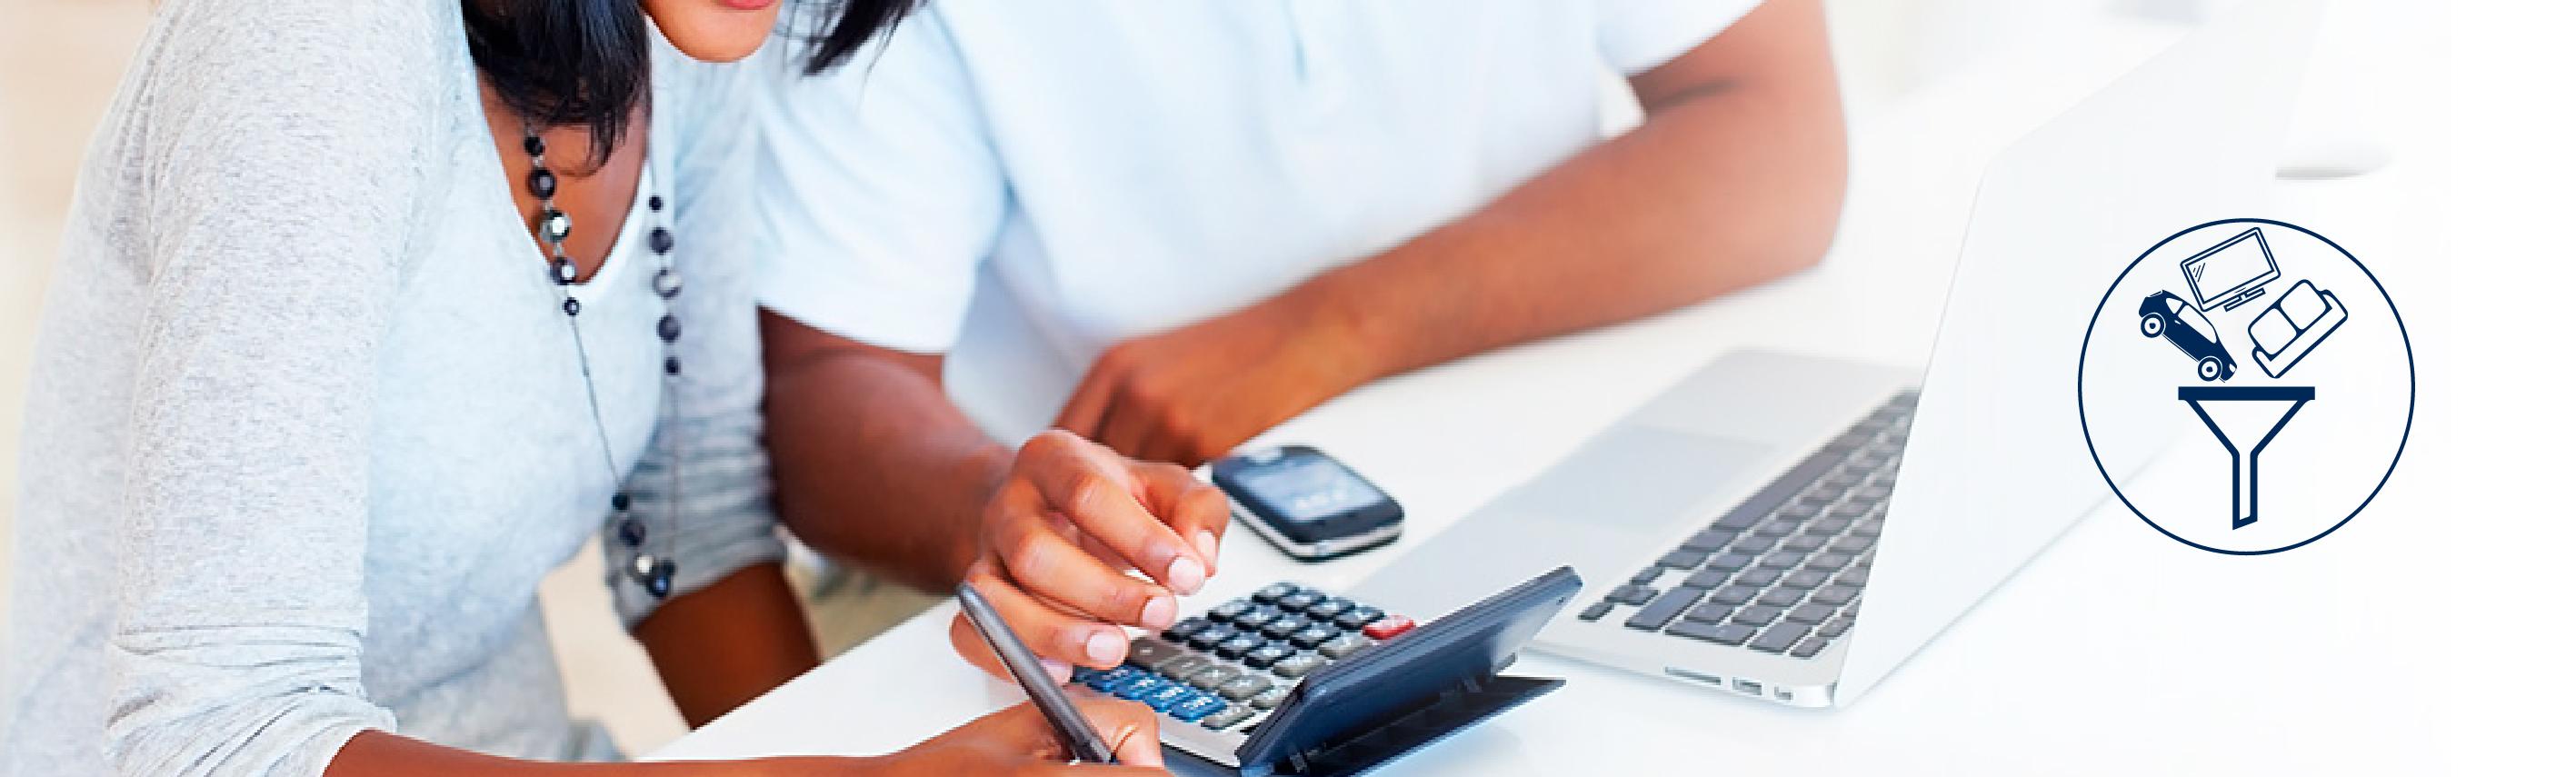 Préstamo para Consolidación de Deudas